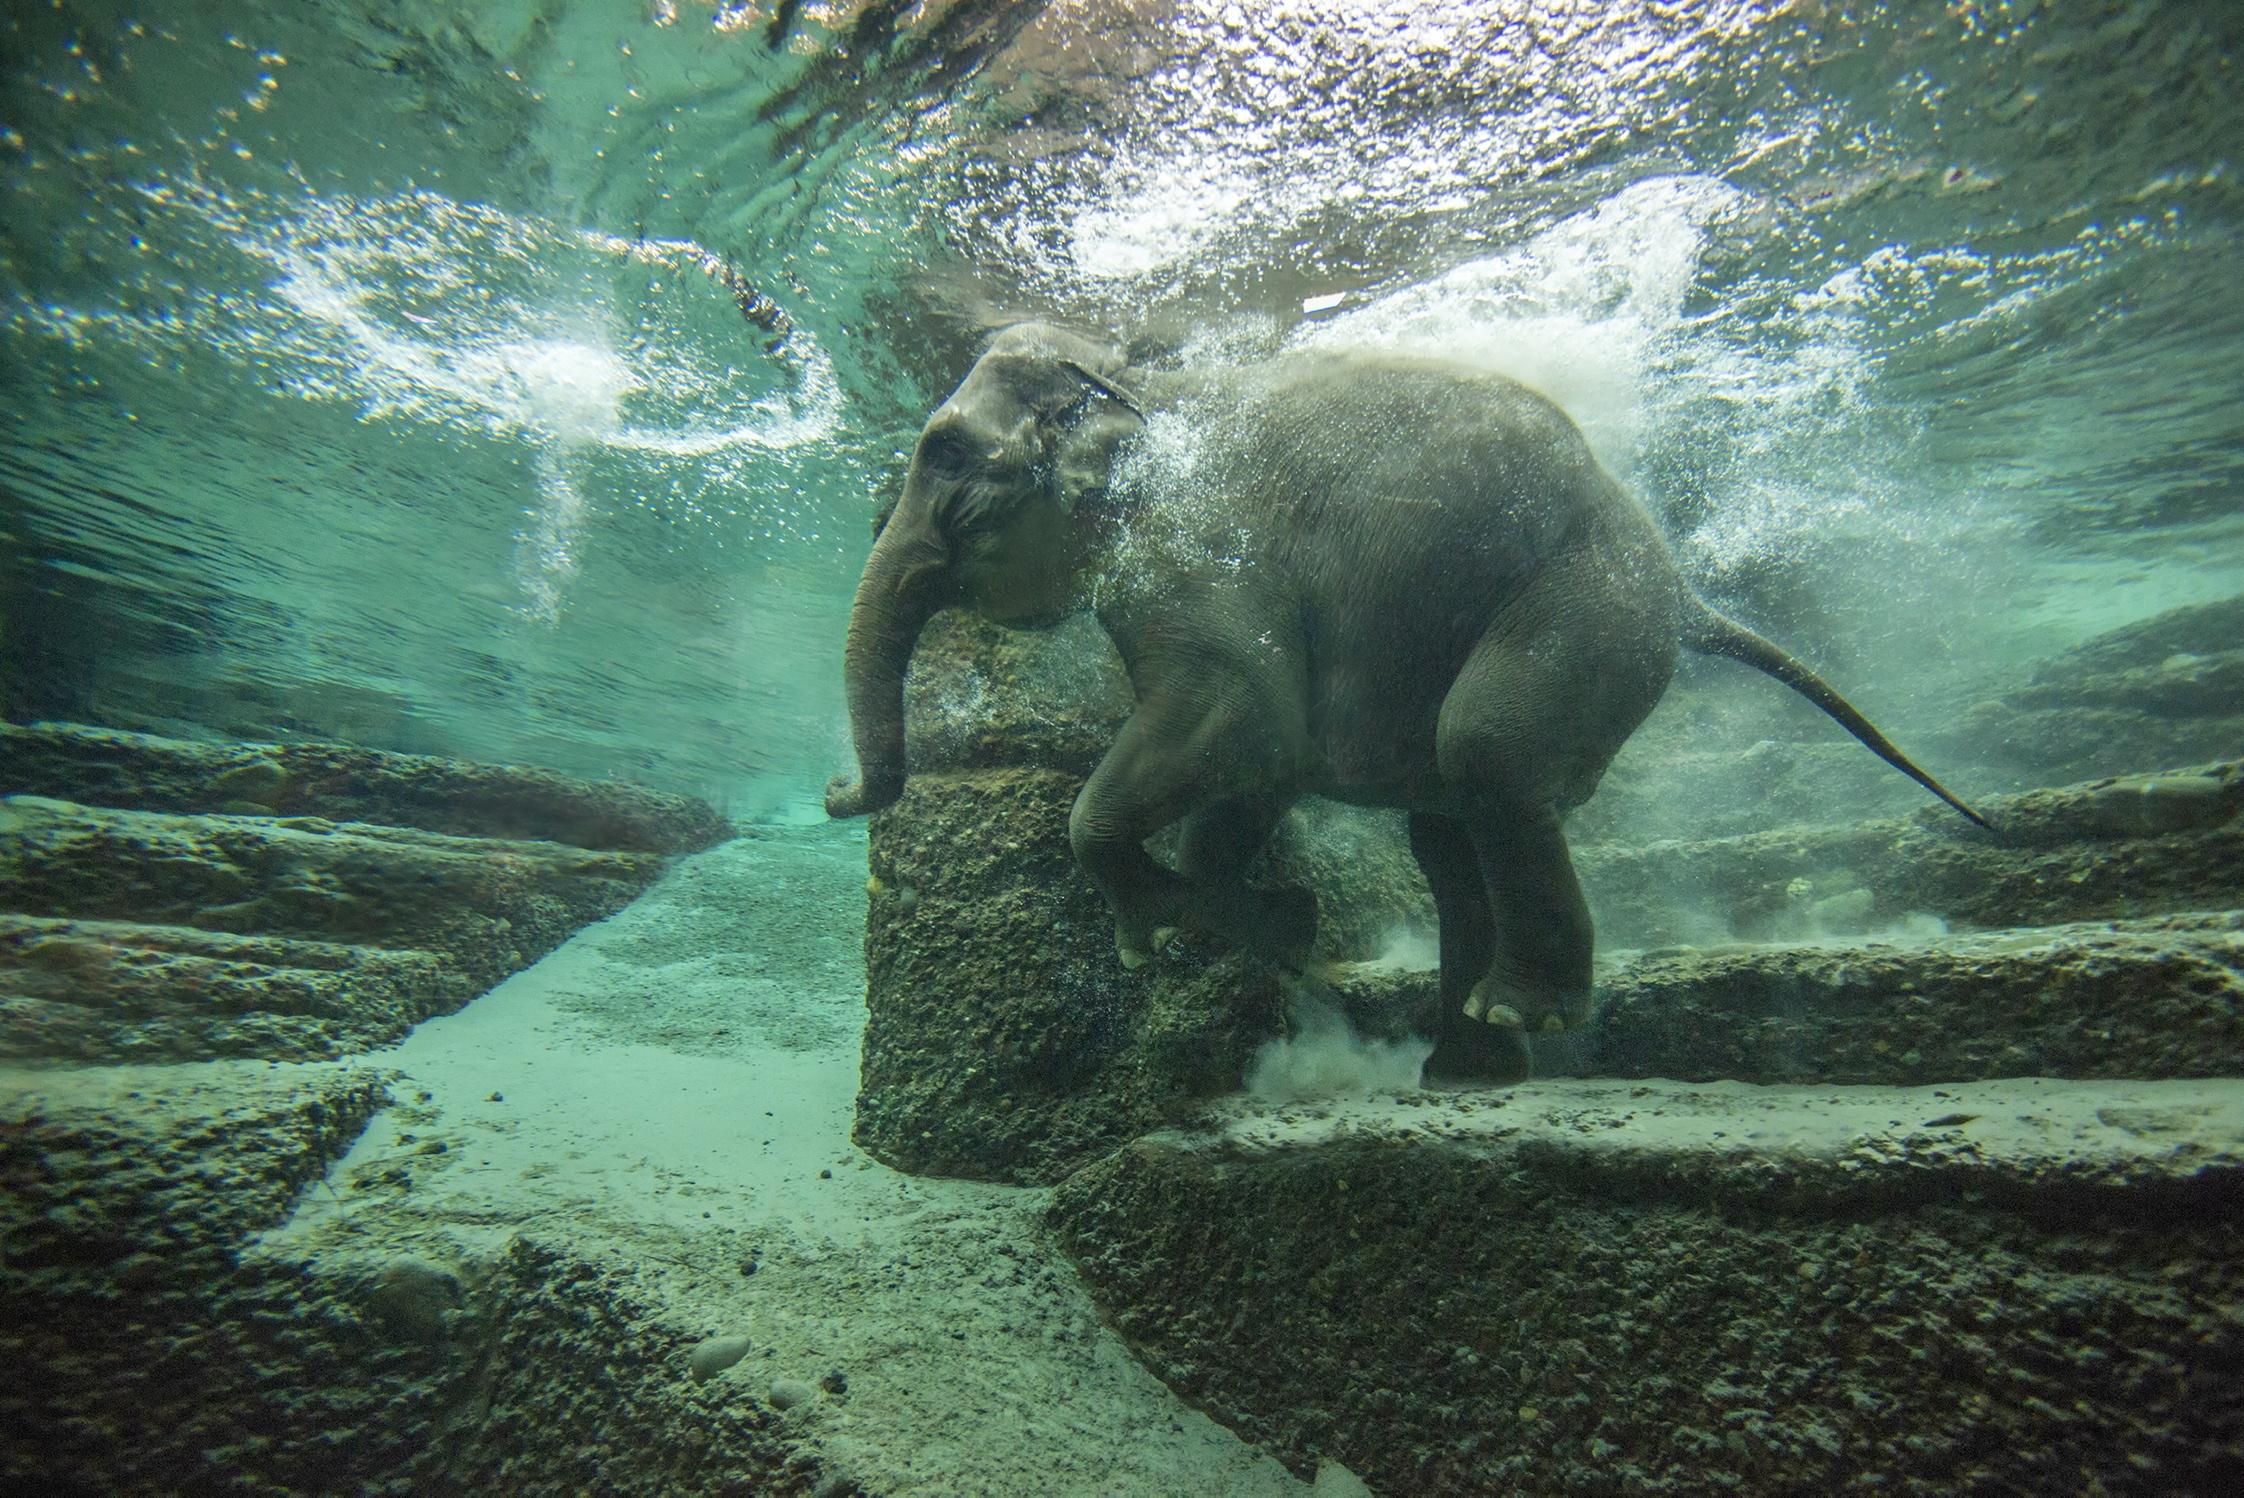 Elefantenbaden im Zoo Zürich